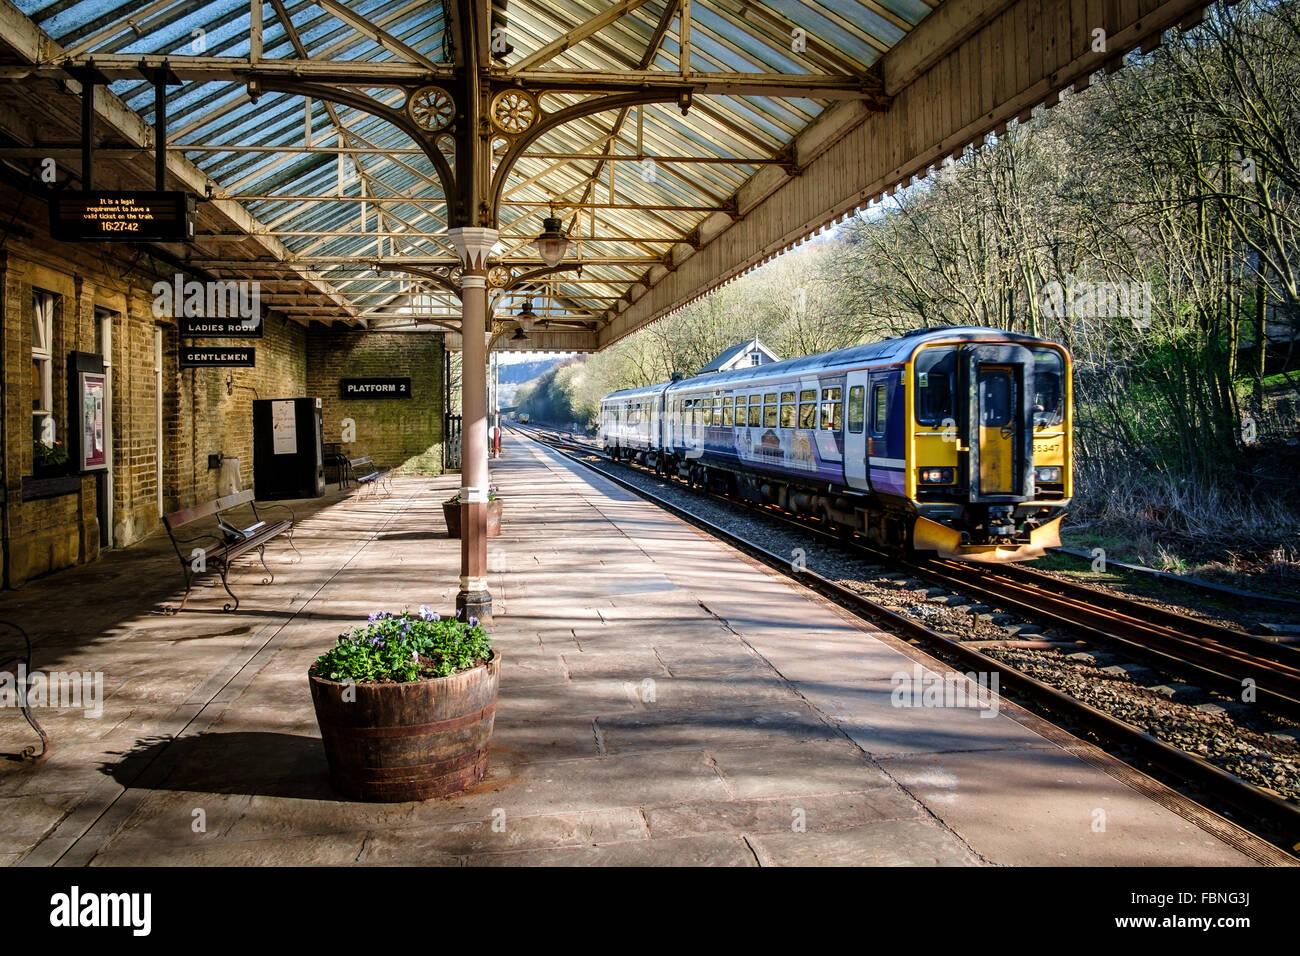 Northern Rail train pulling into Hebden Bridge station, West Yorkshire, England. - Stock Image